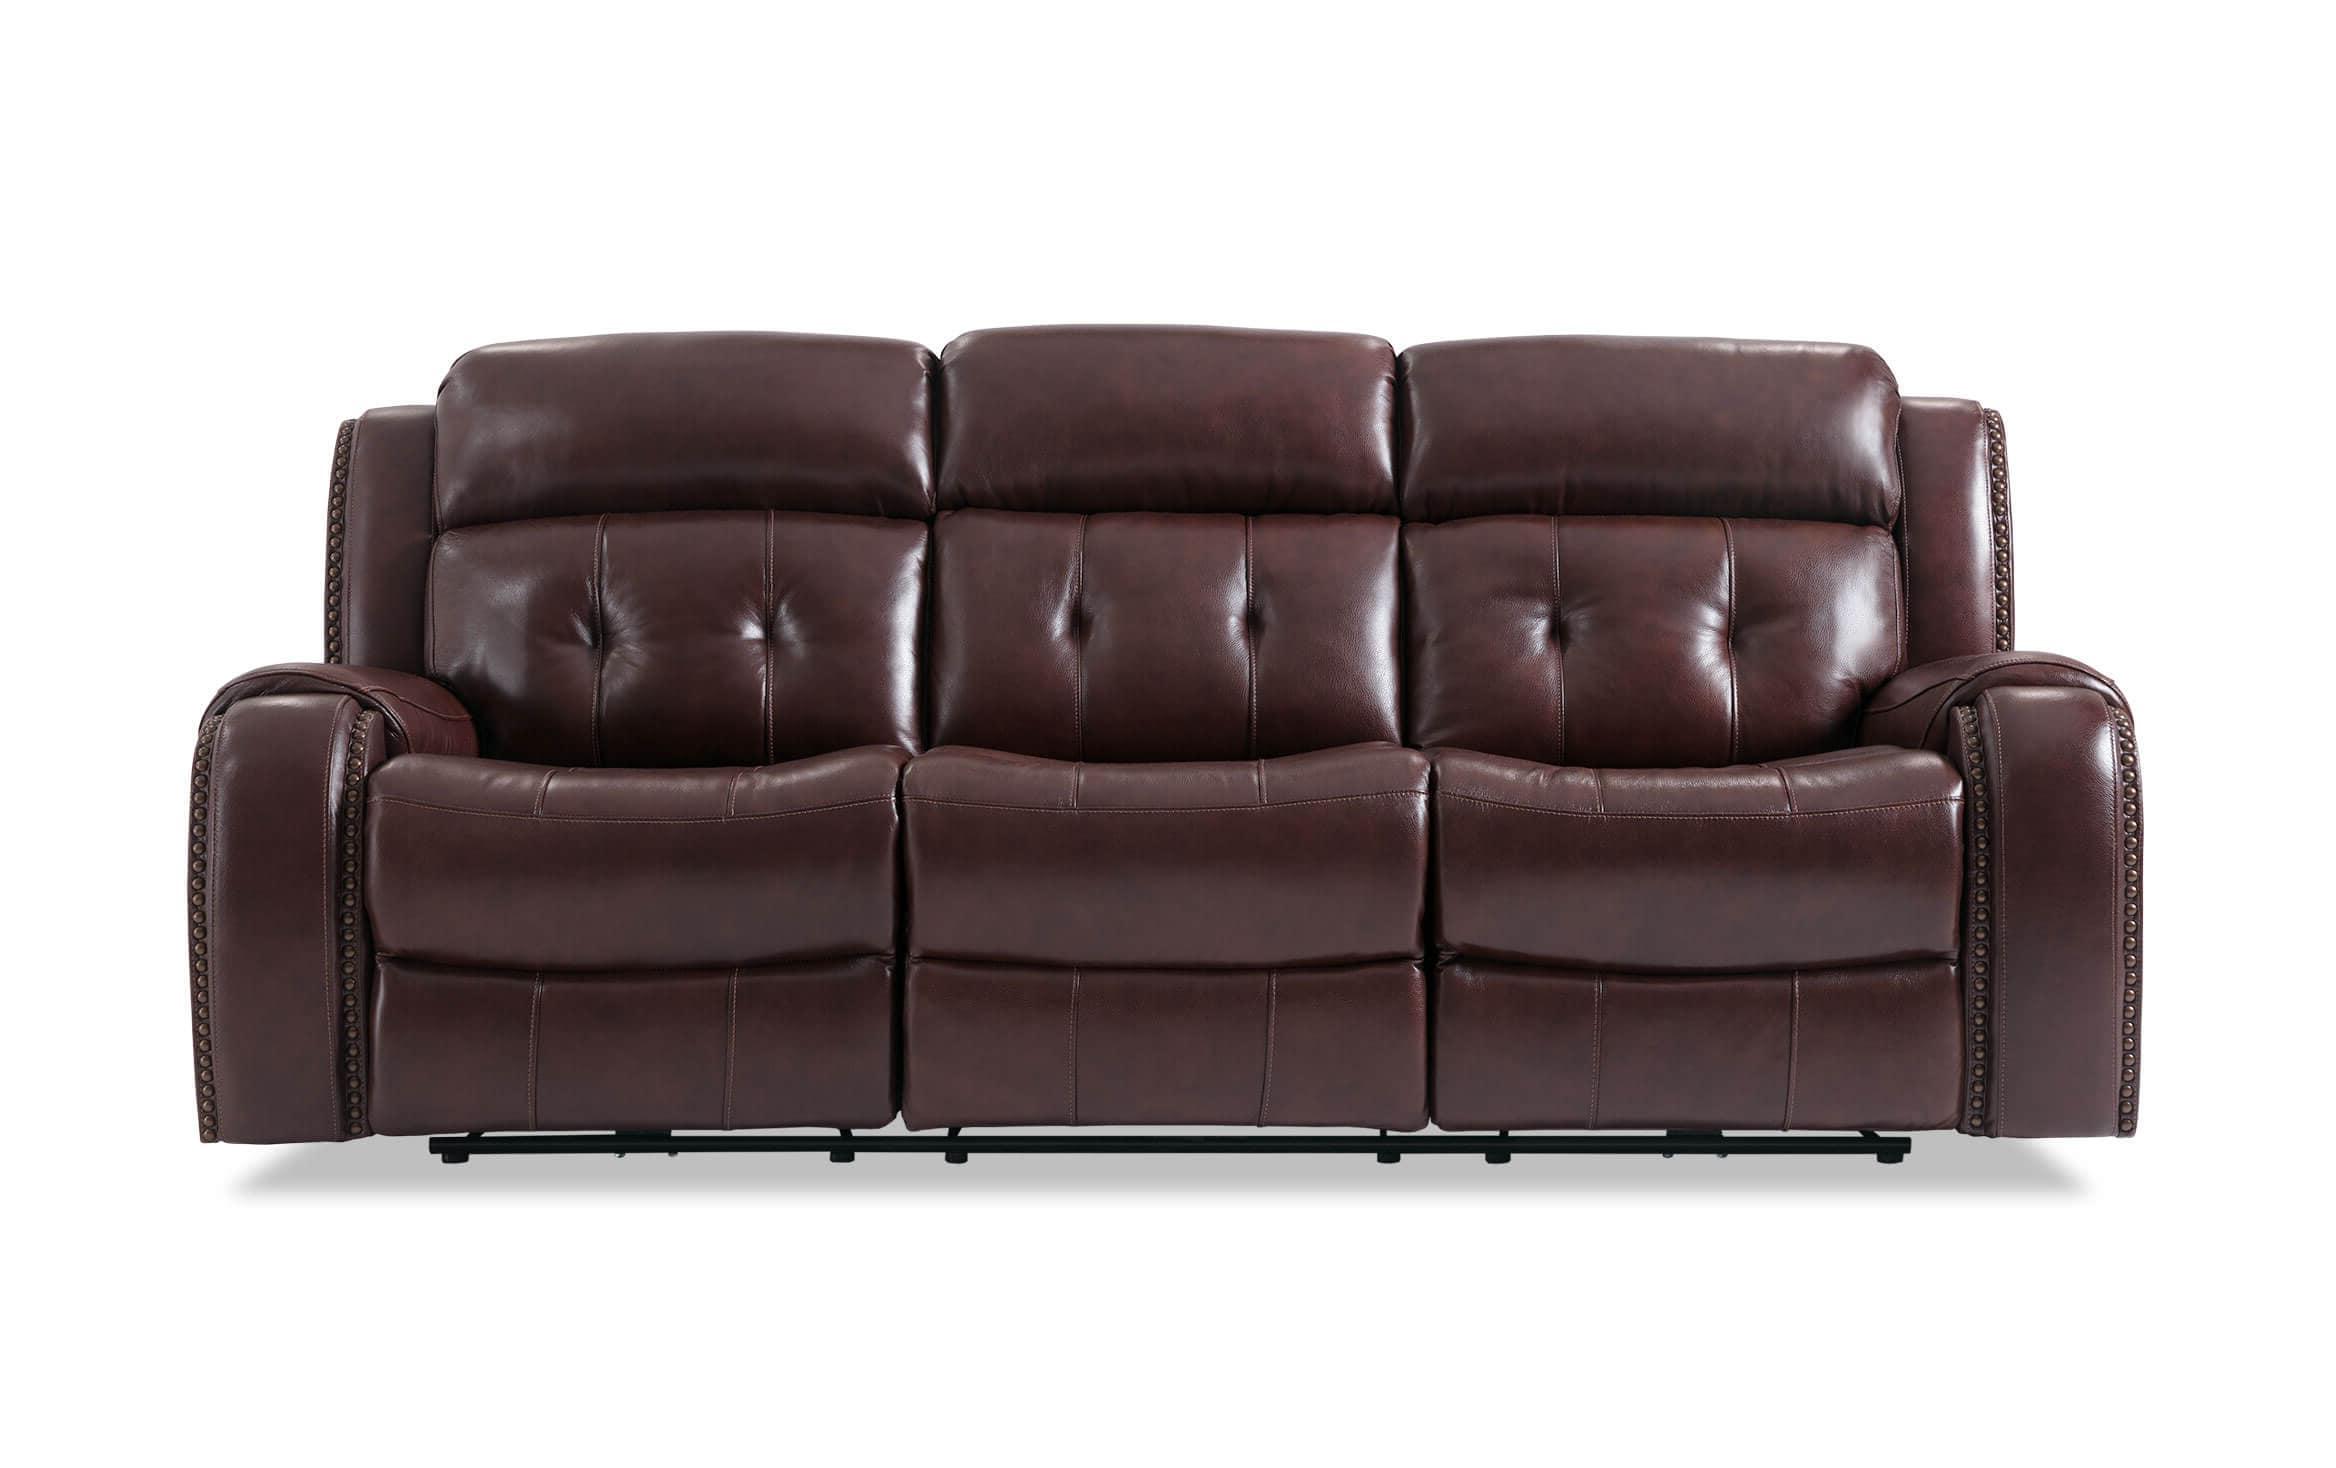 Bobs Furniture Leather Sofa : Trailblazer Gray Leather Throughout Best And Newest Trailblazer Gray Leather Power Reclining Sofas (View 4 of 20)